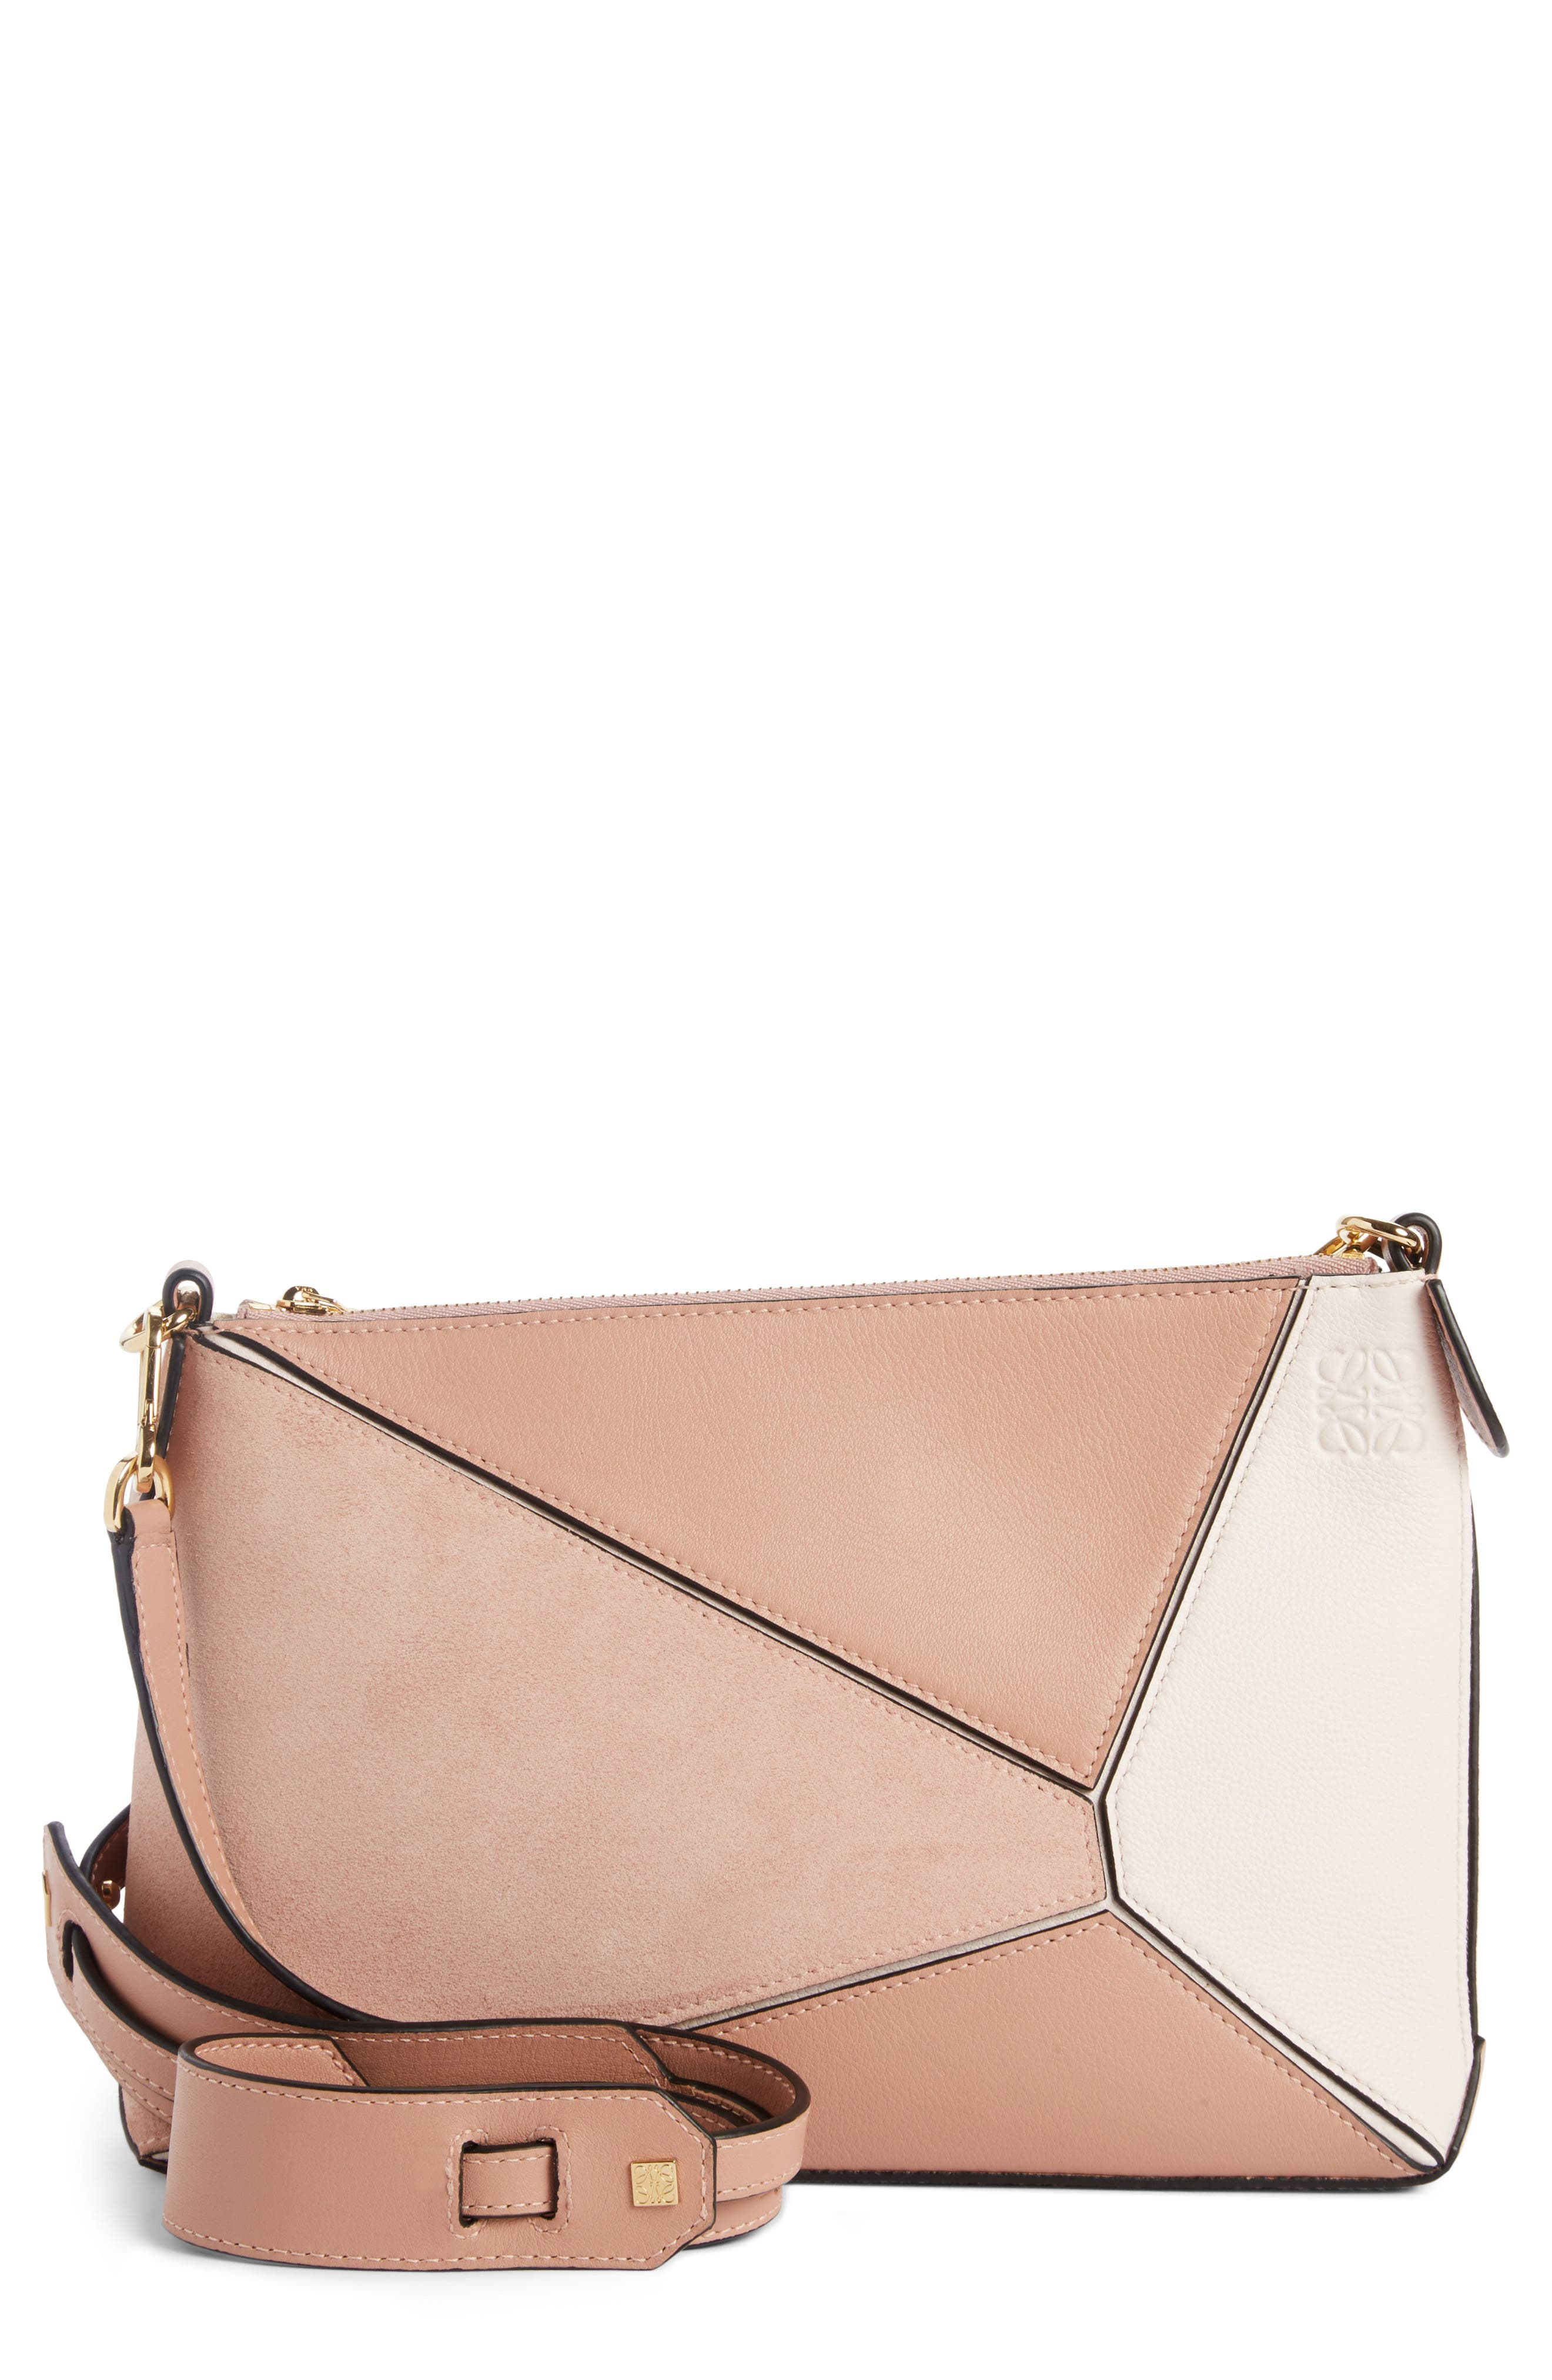 Mini Puzzle Leather Crossbody Bag,                             Main thumbnail 1, color,                             Blush Multitone